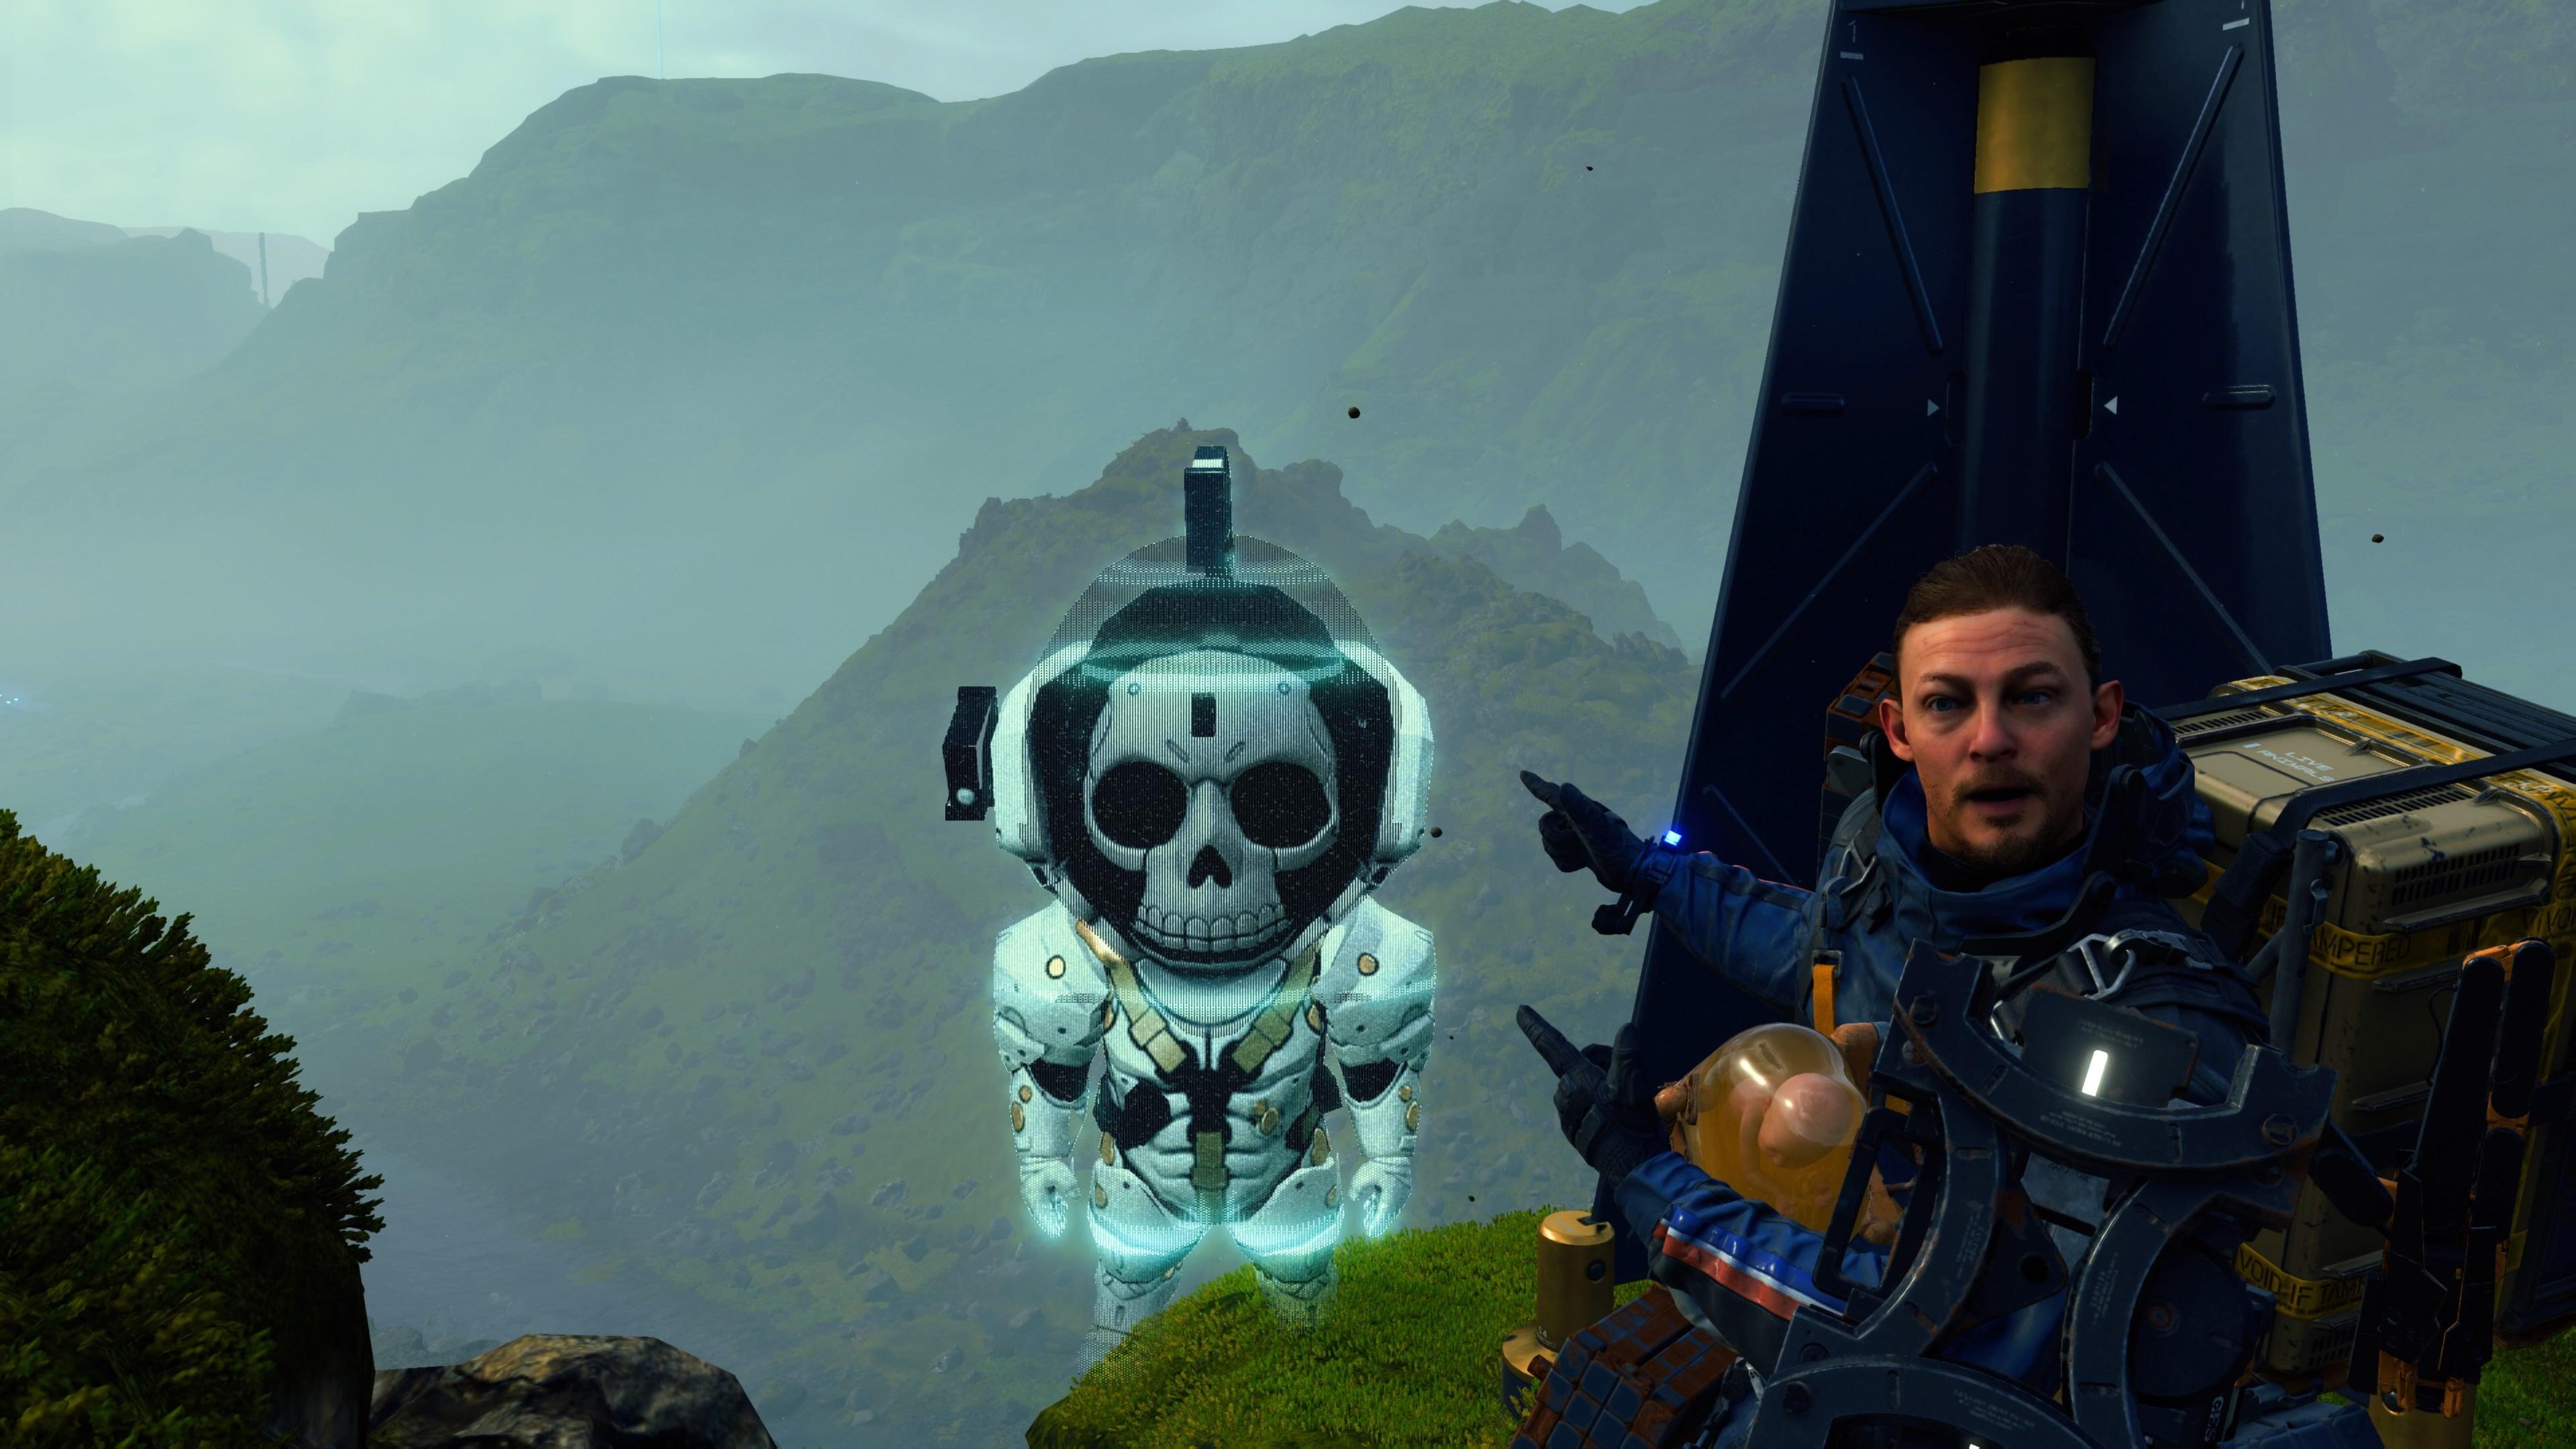 Sam poses beside a Ludens Nendoroid hologram.